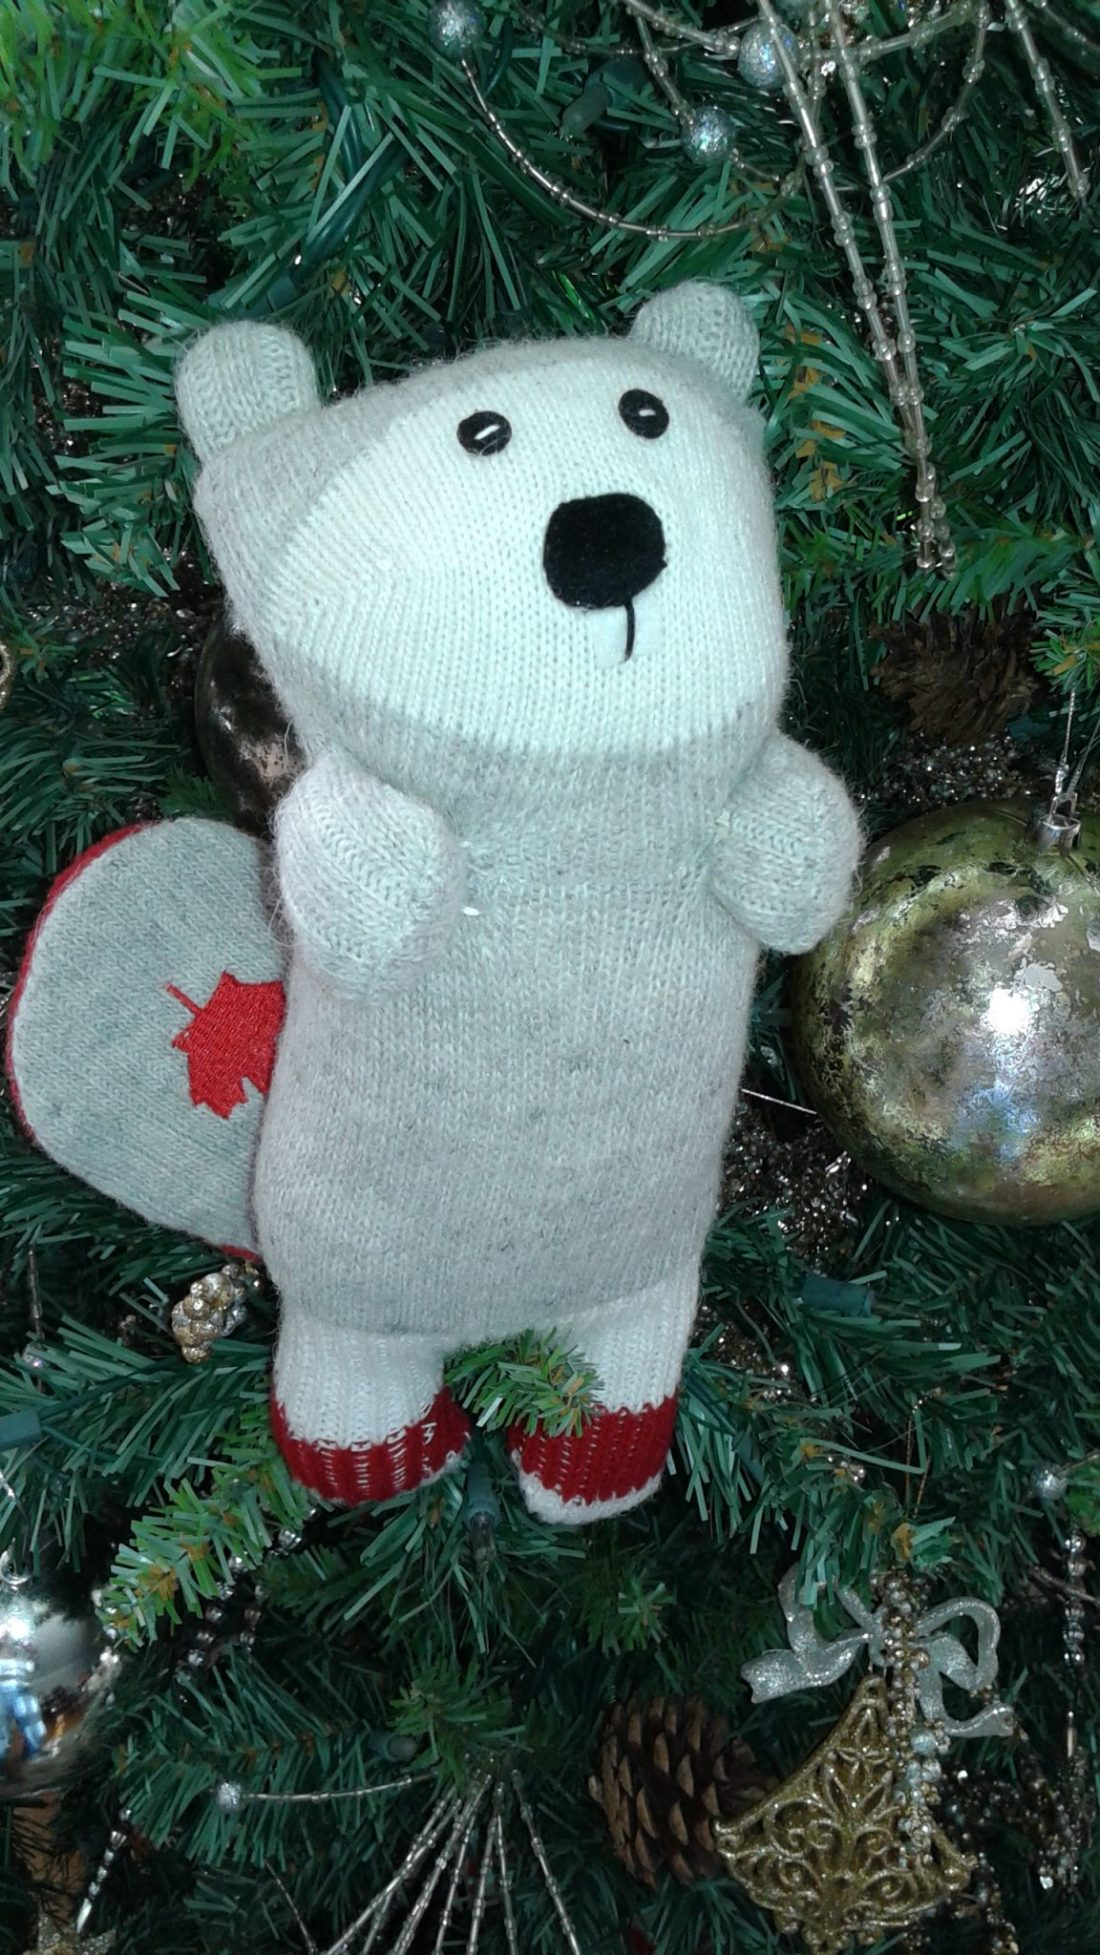 Meet Burl C.A. our BCA Mascot - he's a hockey sock beaver & a burlennial - find him on our Instagram!